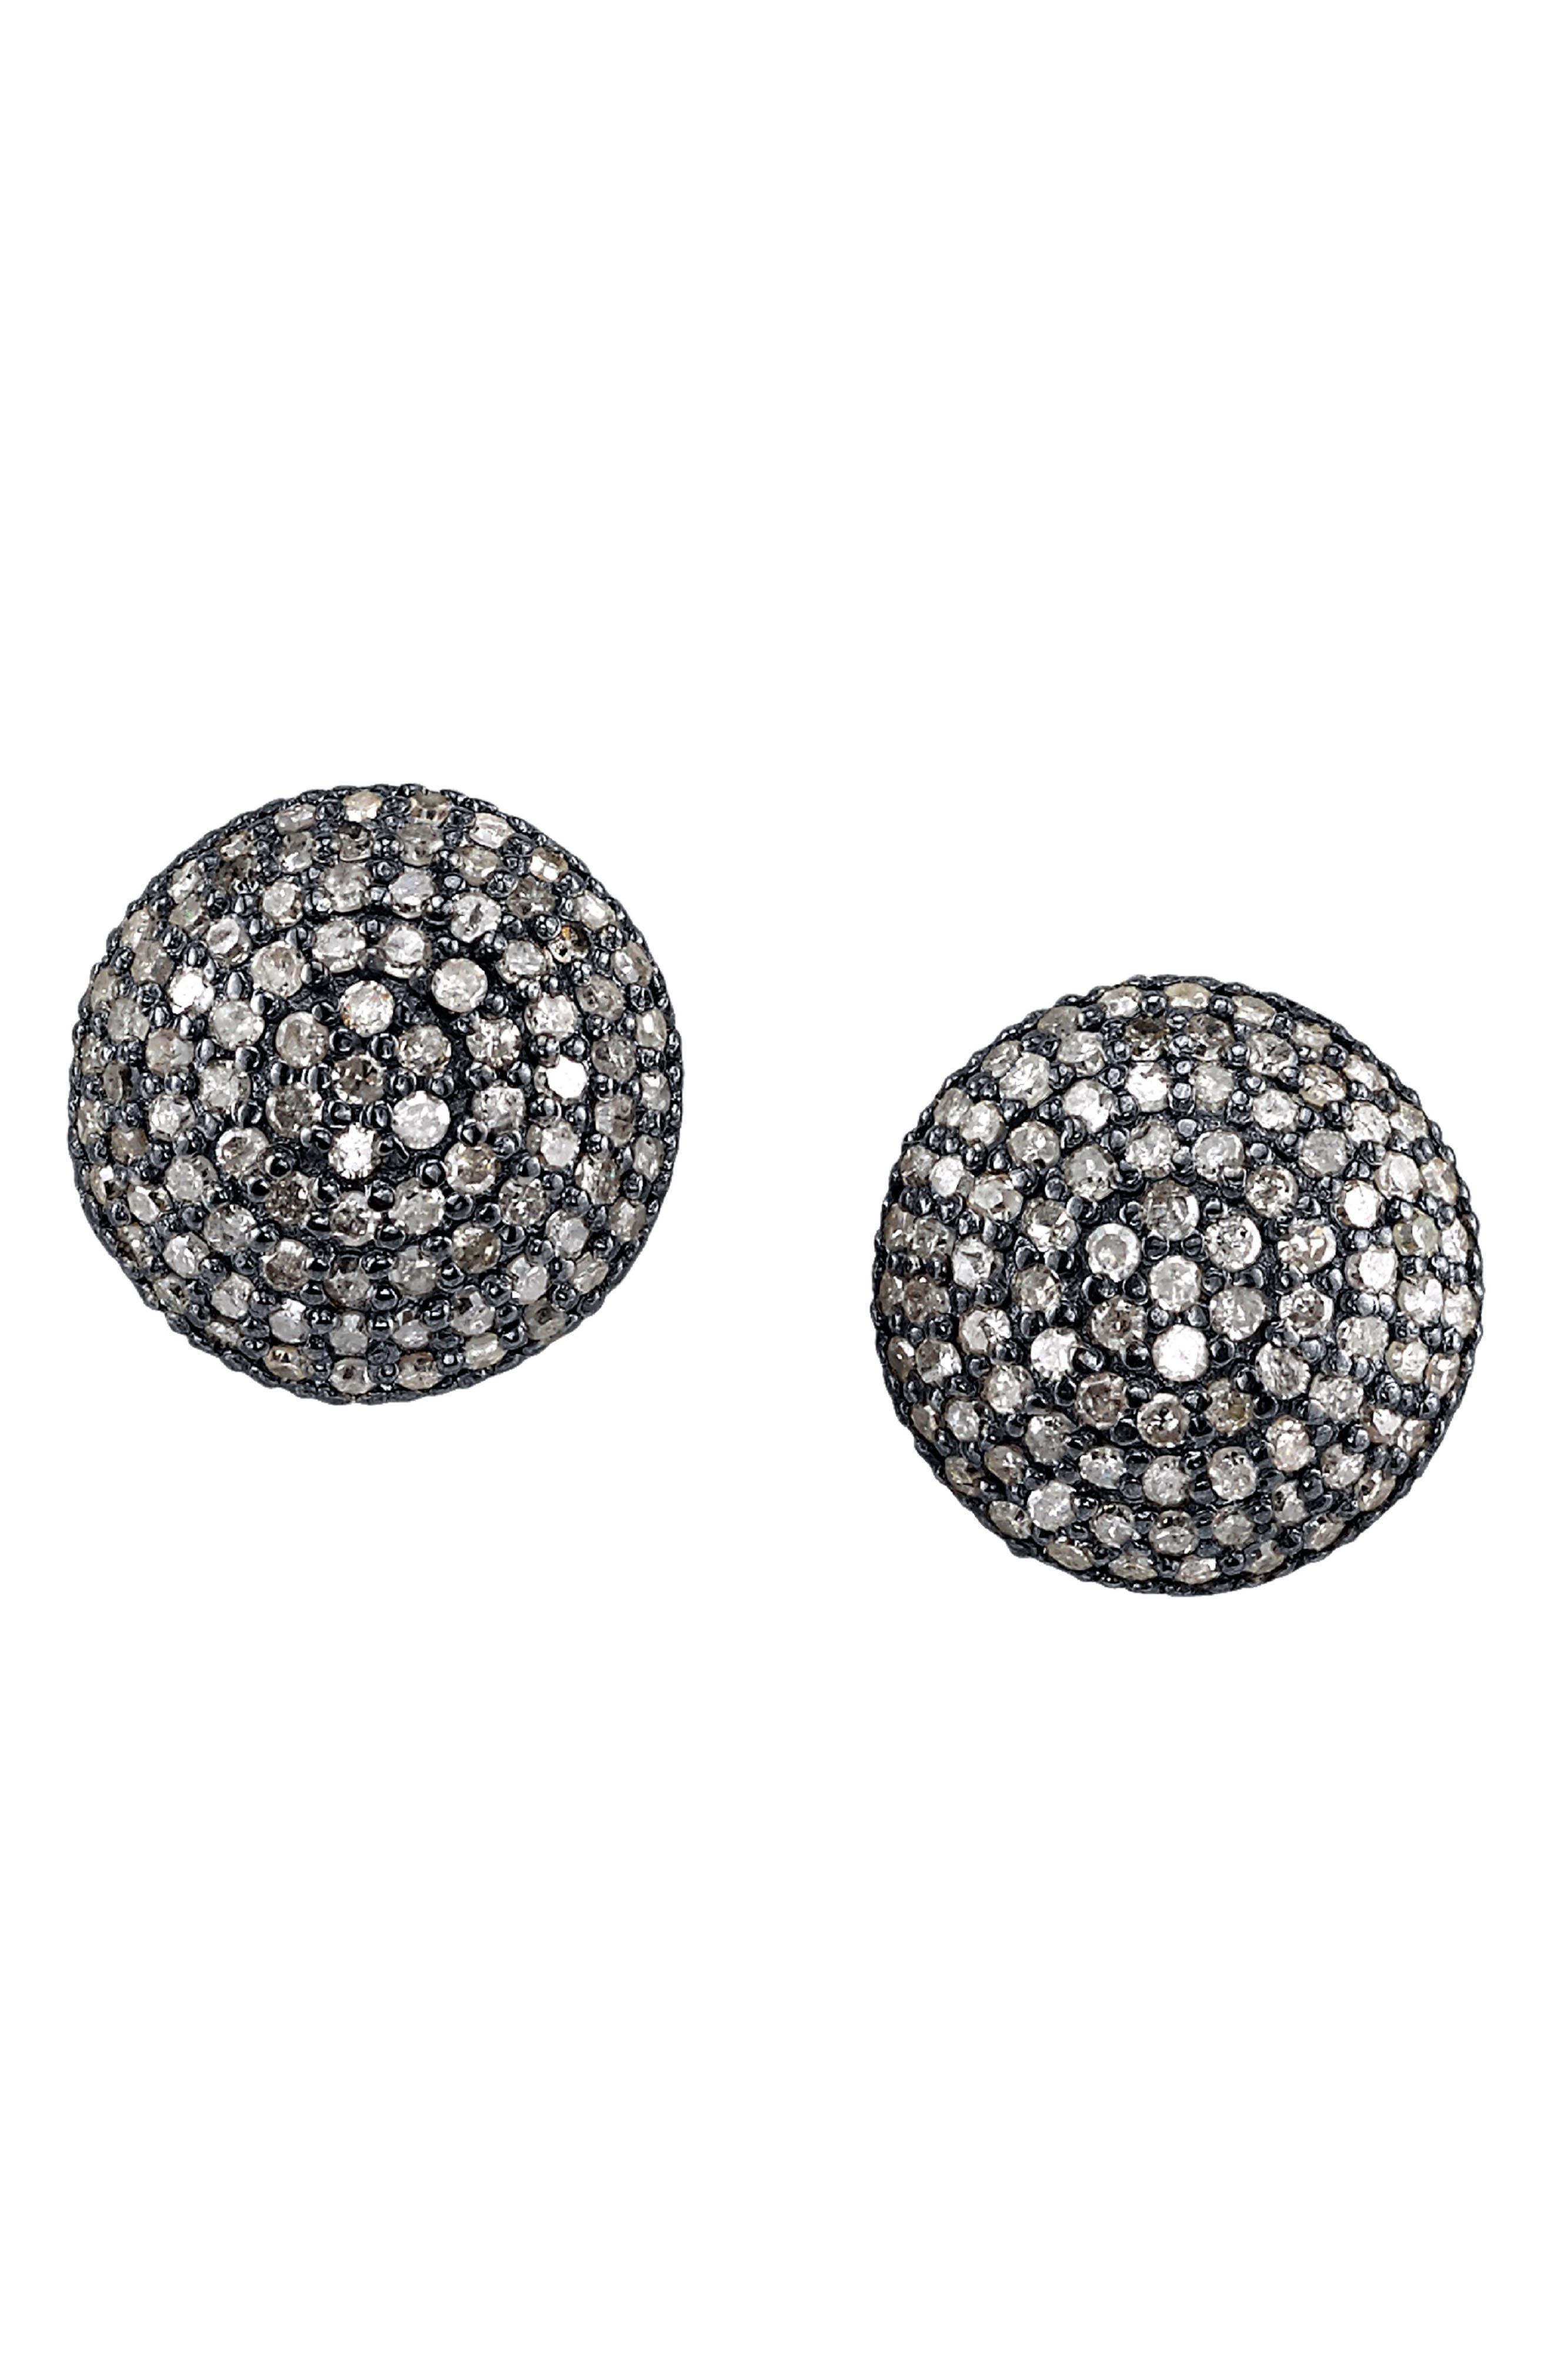 SHERYL LOWE Pave Diamond Dome Stud Earrings in Sterling Silver